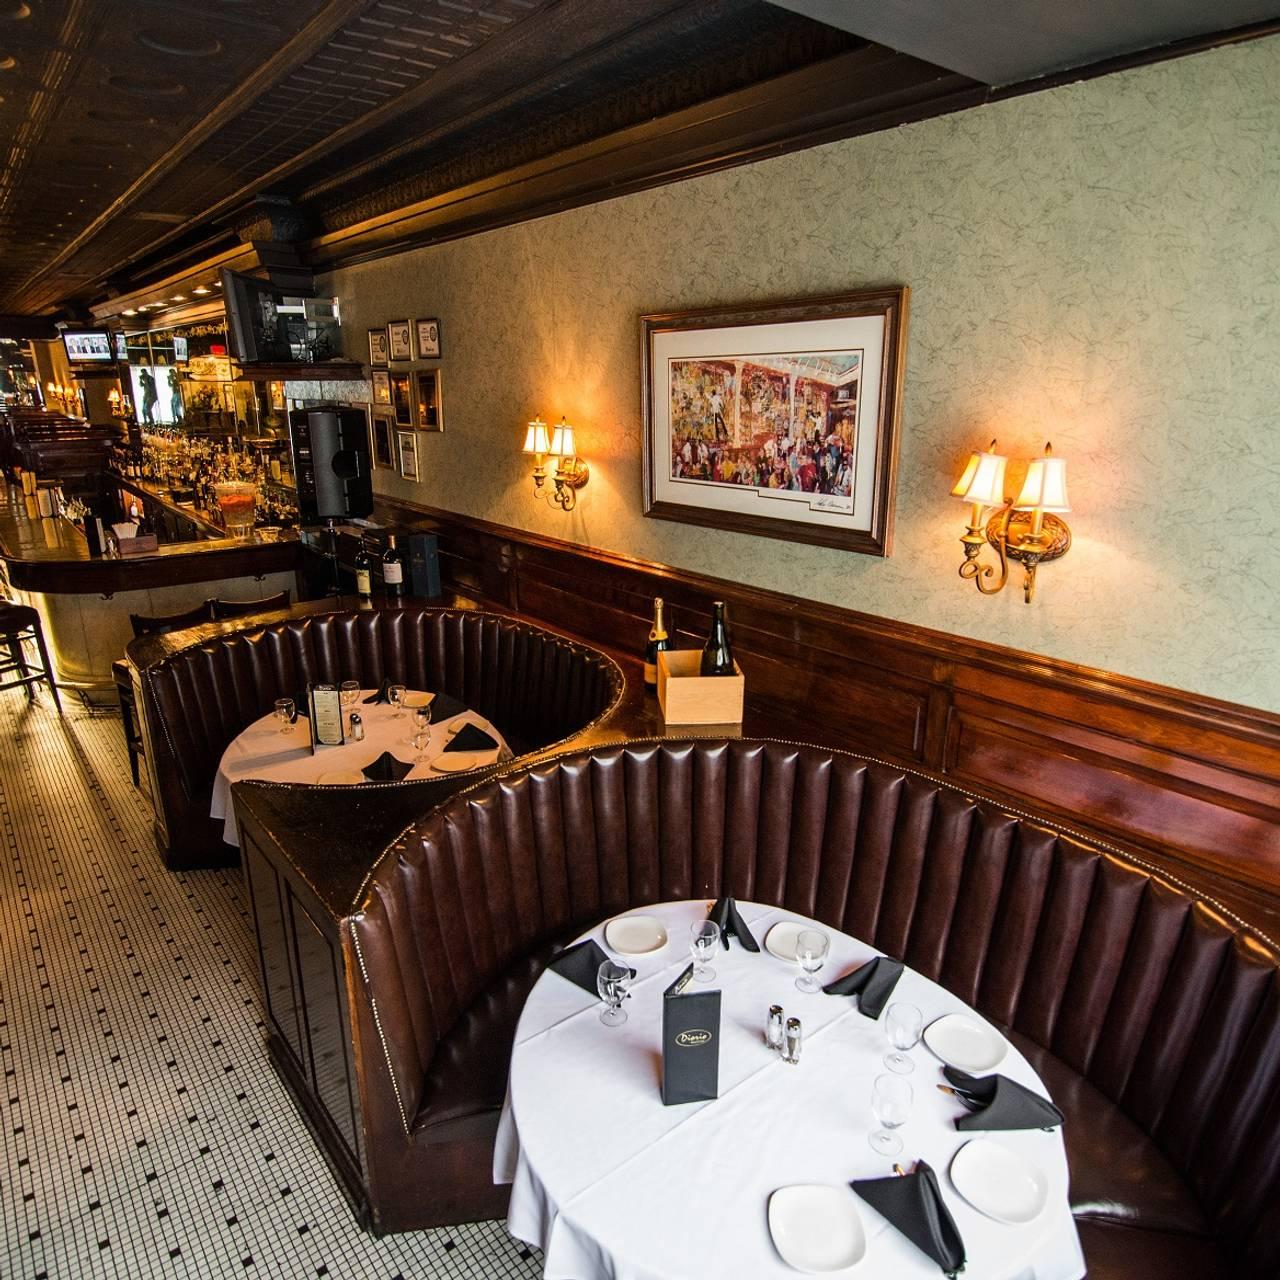 Diorio S Restaurant And Bar Waterbury Ct Opentable